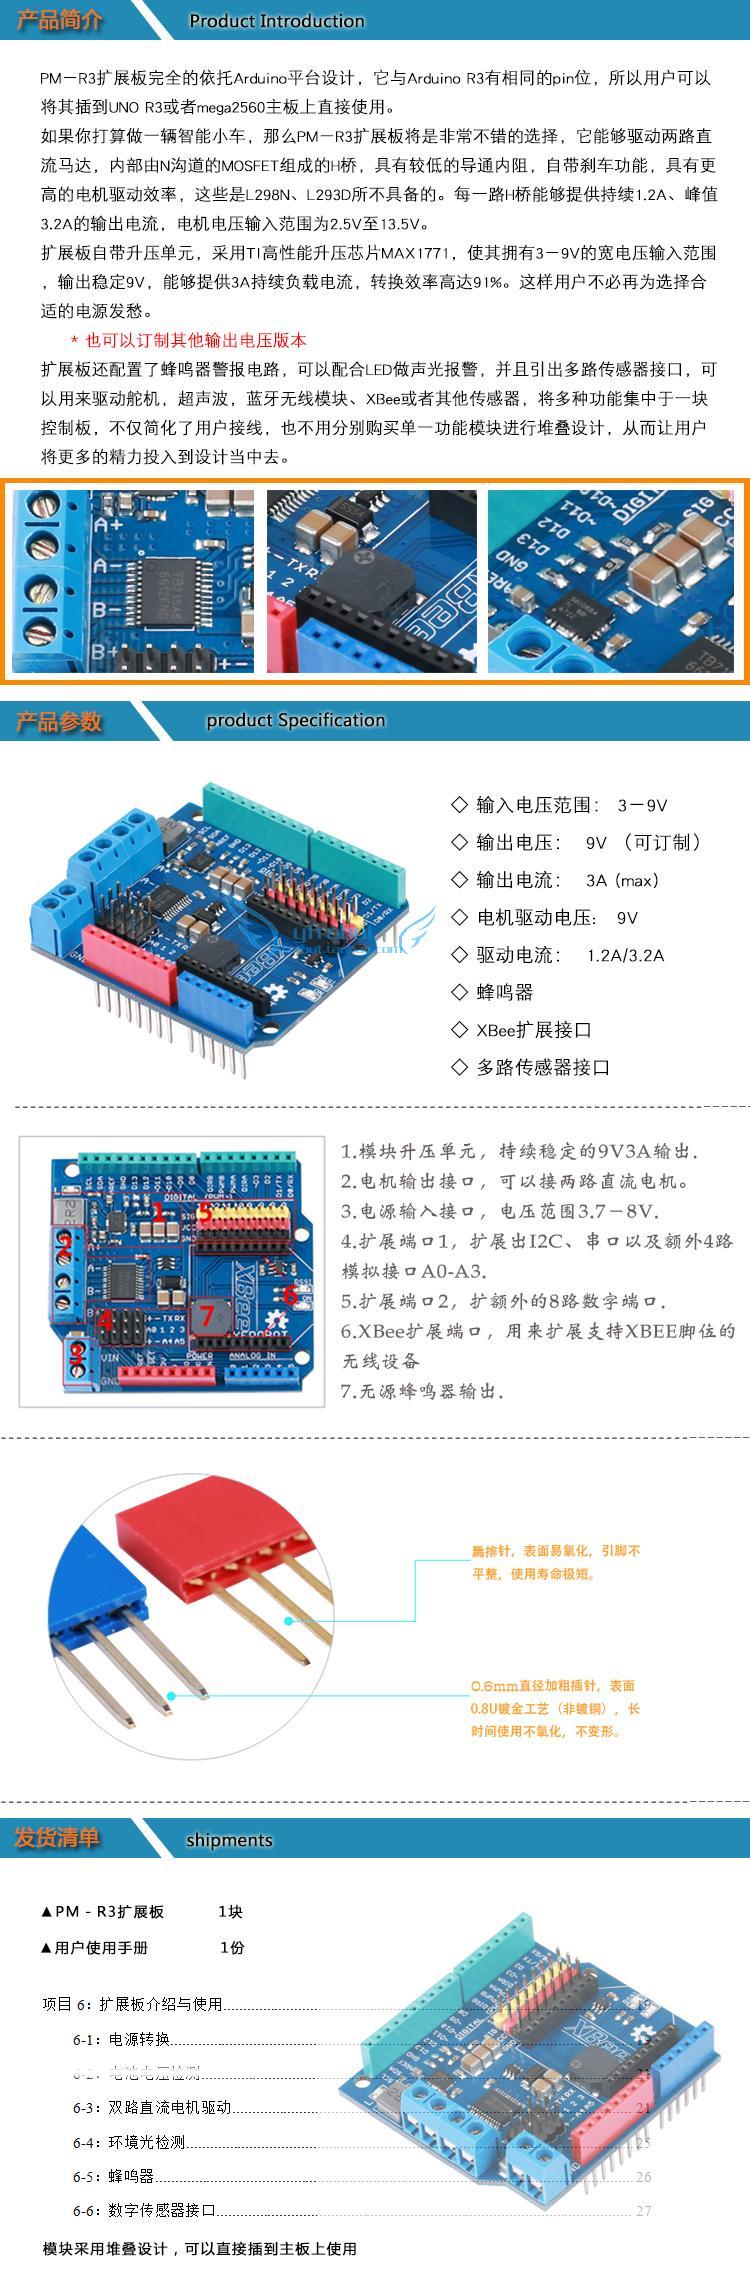 YFROBOT PM-R3 Smart Car Drive Board R3 Expansion Board Multi-function Motor Drive Board